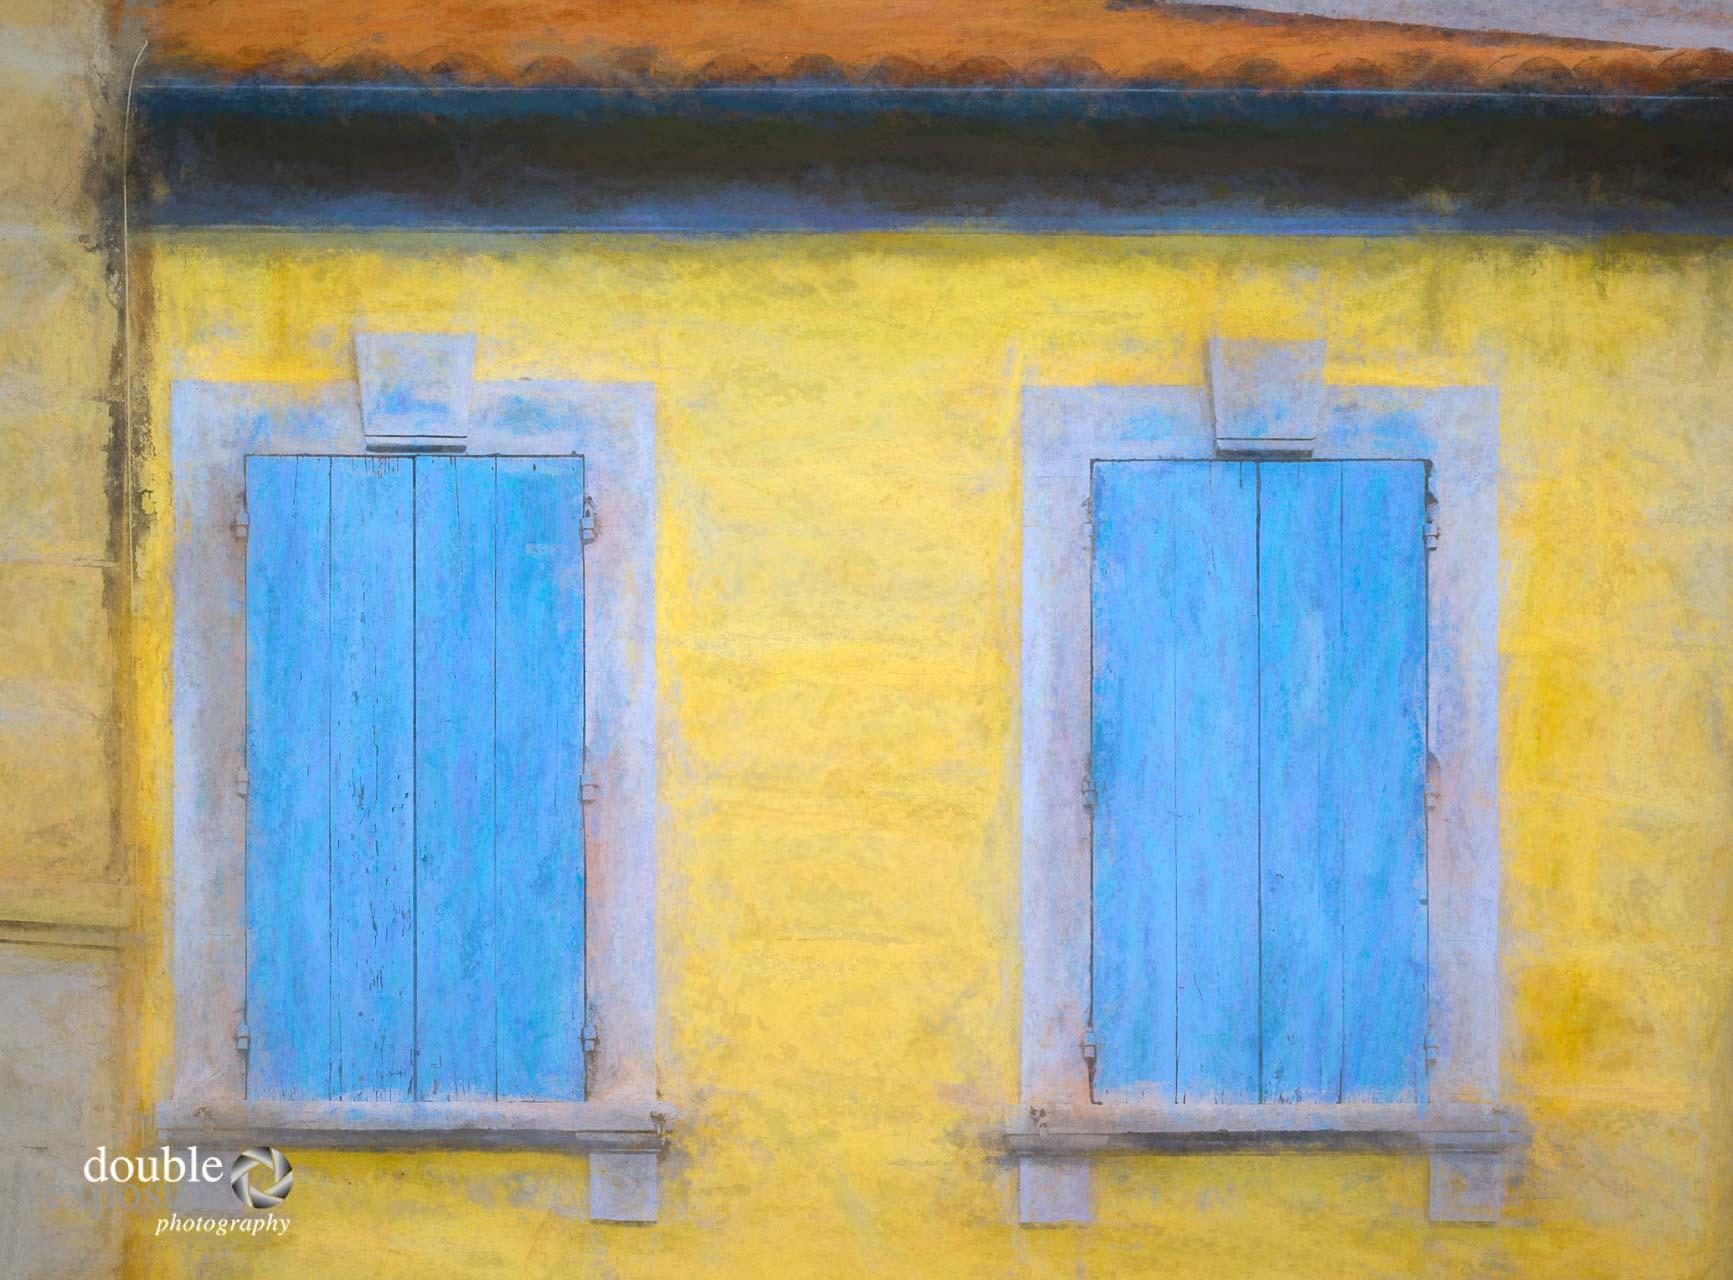 A pair of painted shutters in Arles